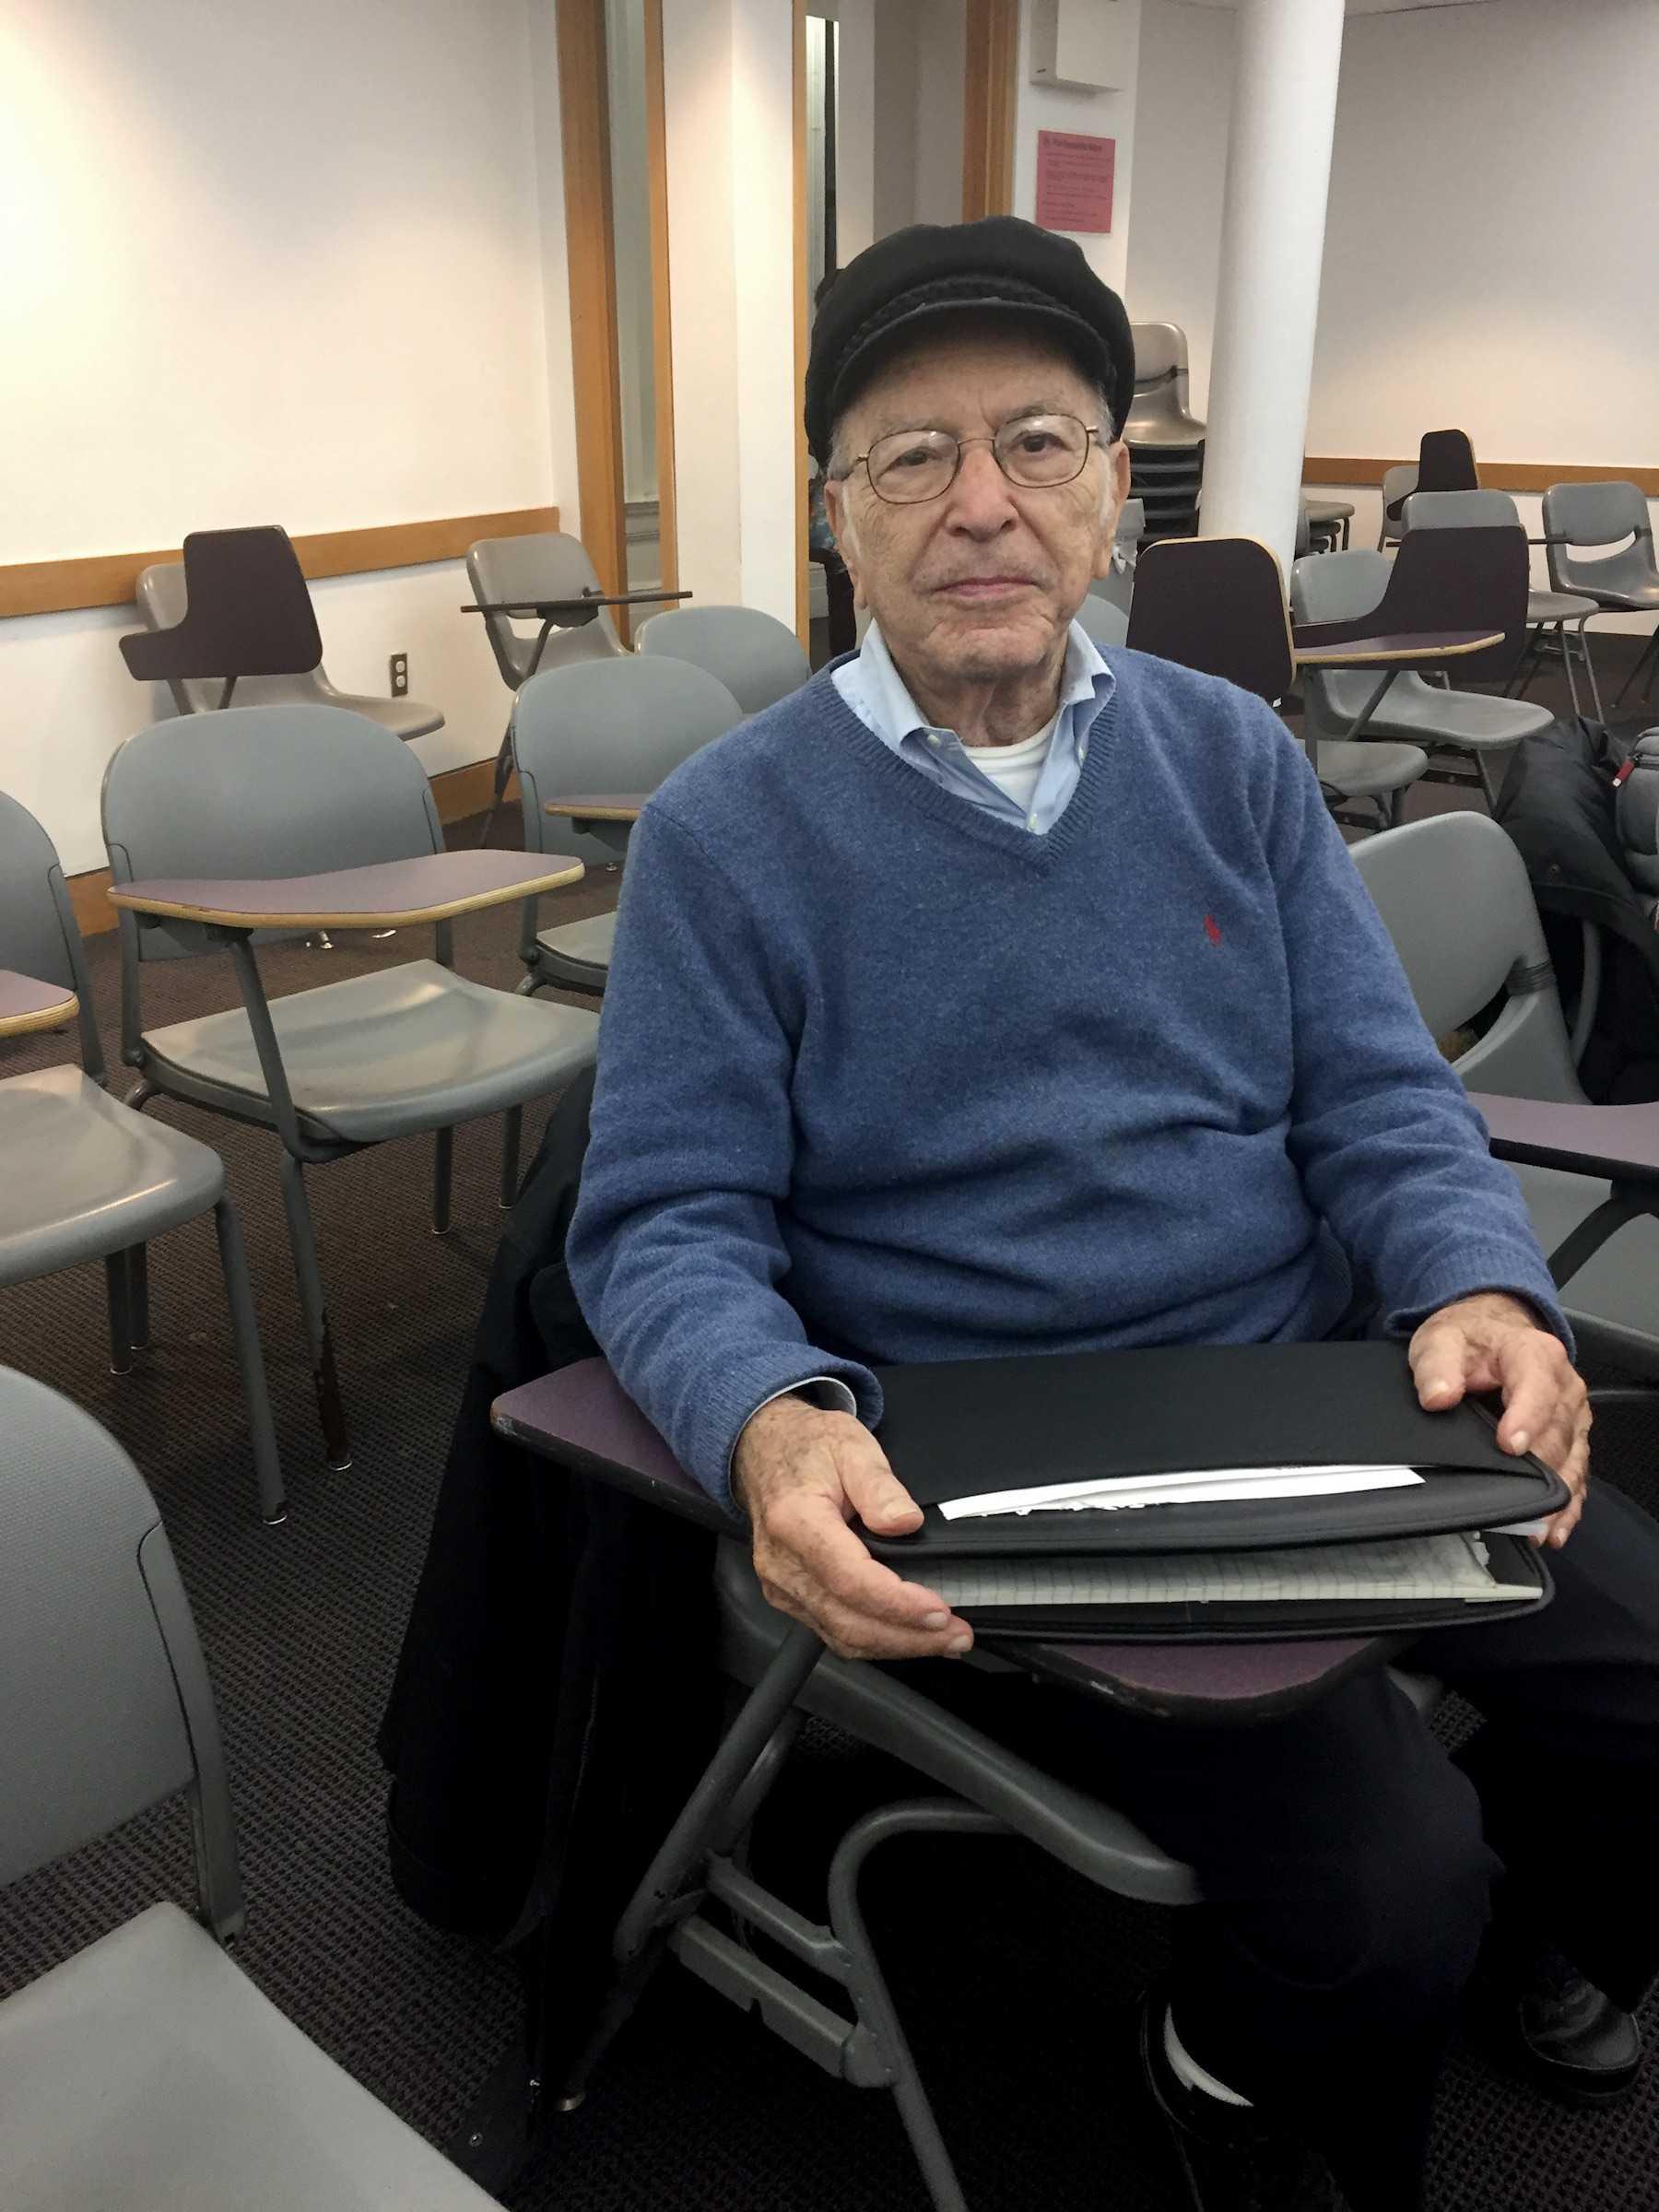 Meet the Man Taking Classes at NYU for 60 Years | Washington